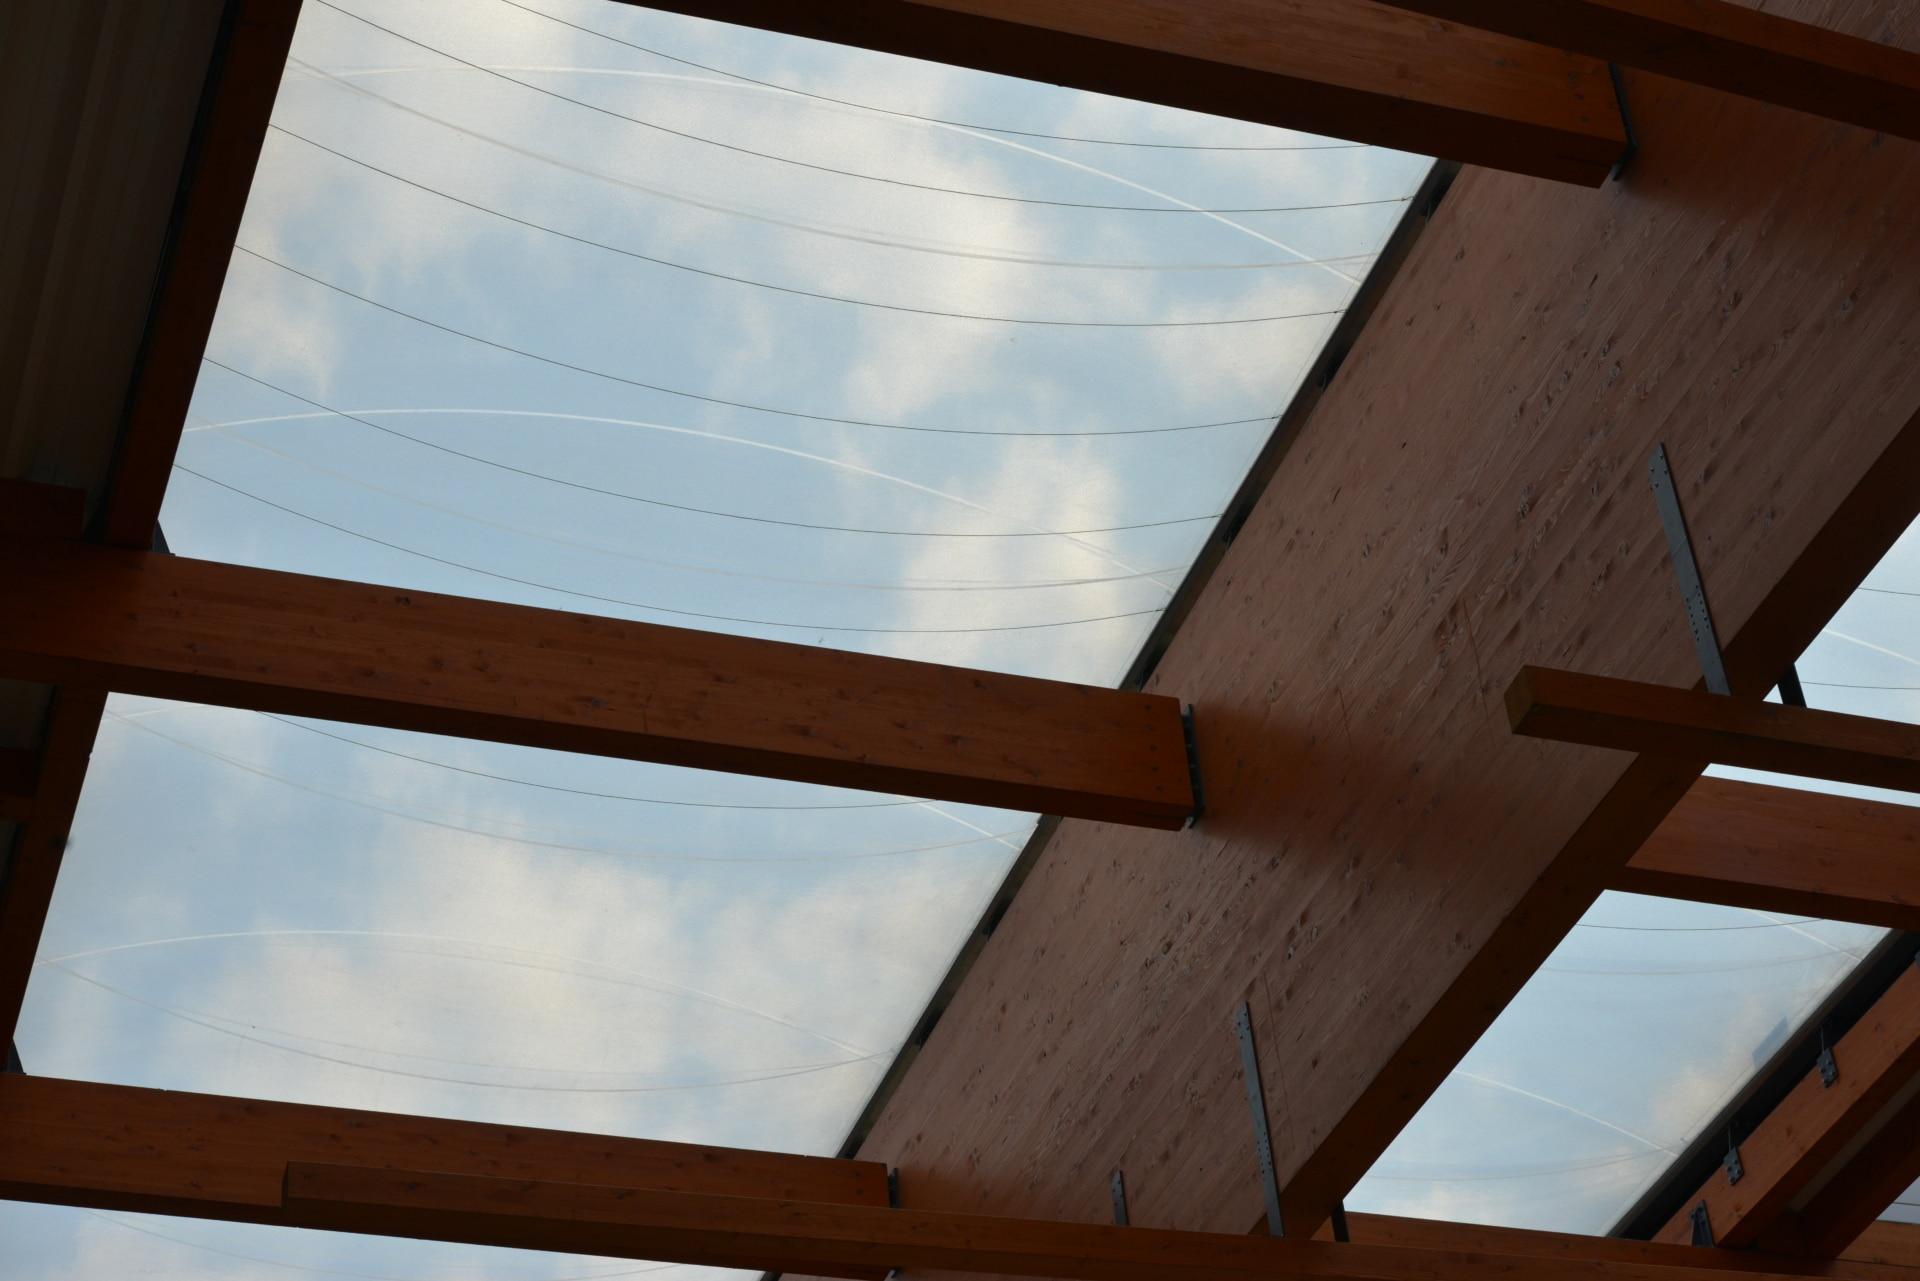 ETFE is UV-transparent